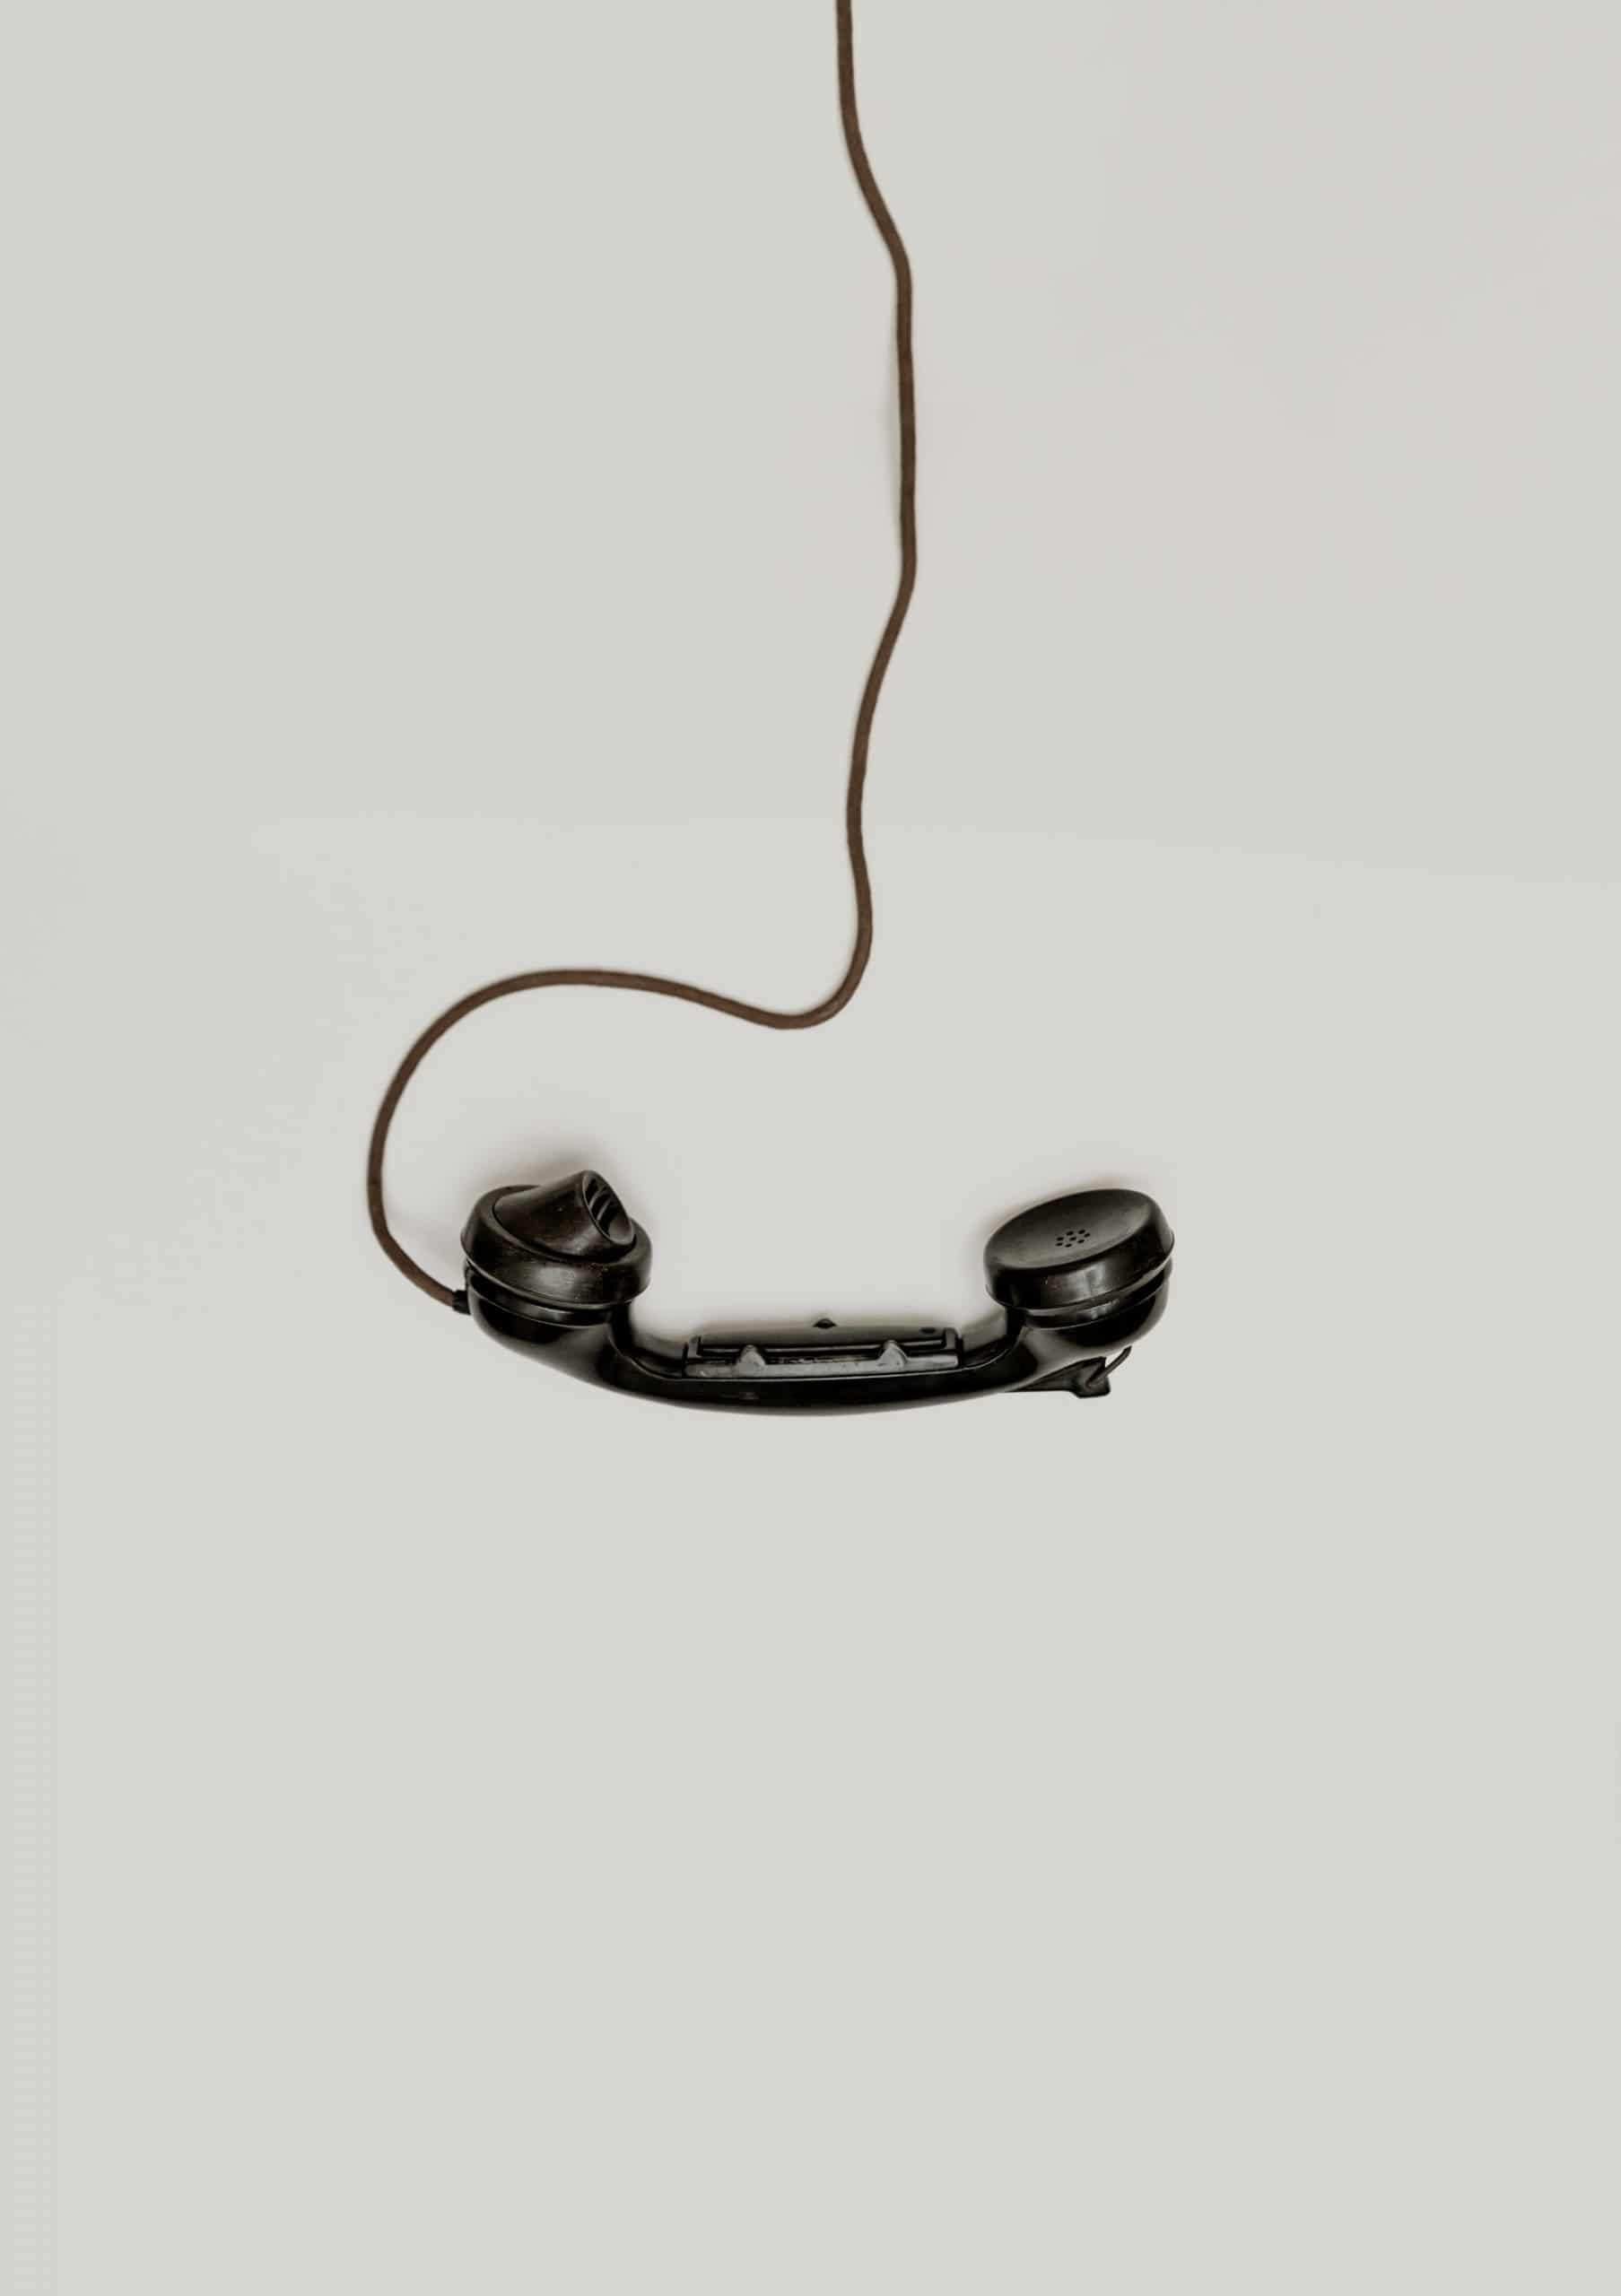 telephone on cord